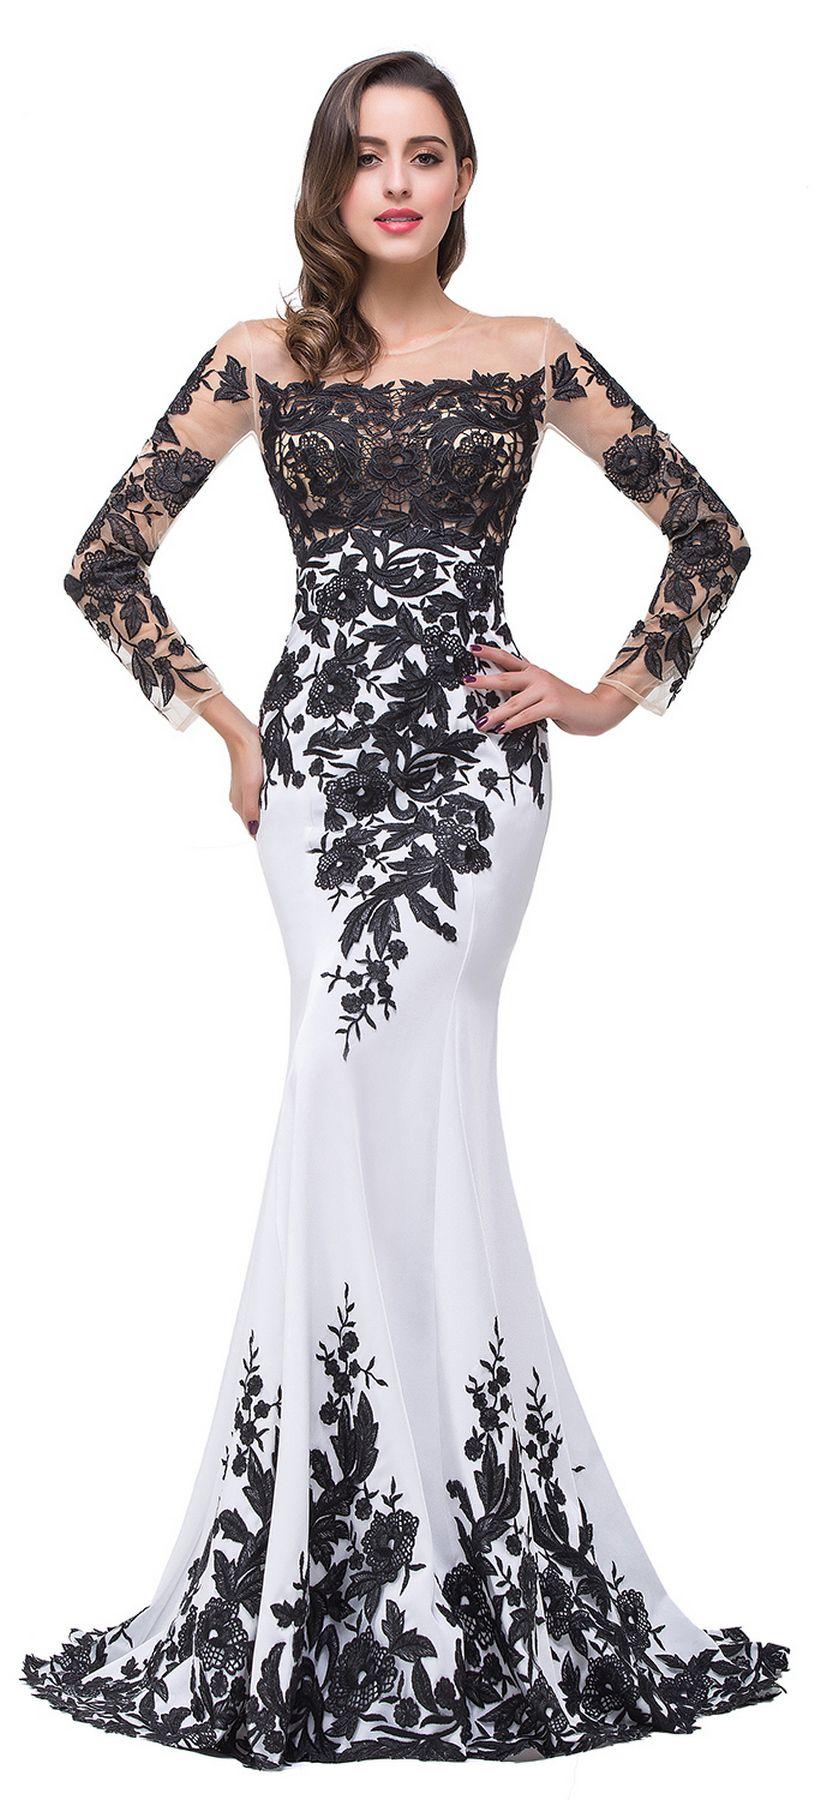 Popular black long sleeve wedding dresses ideas wedding dresses